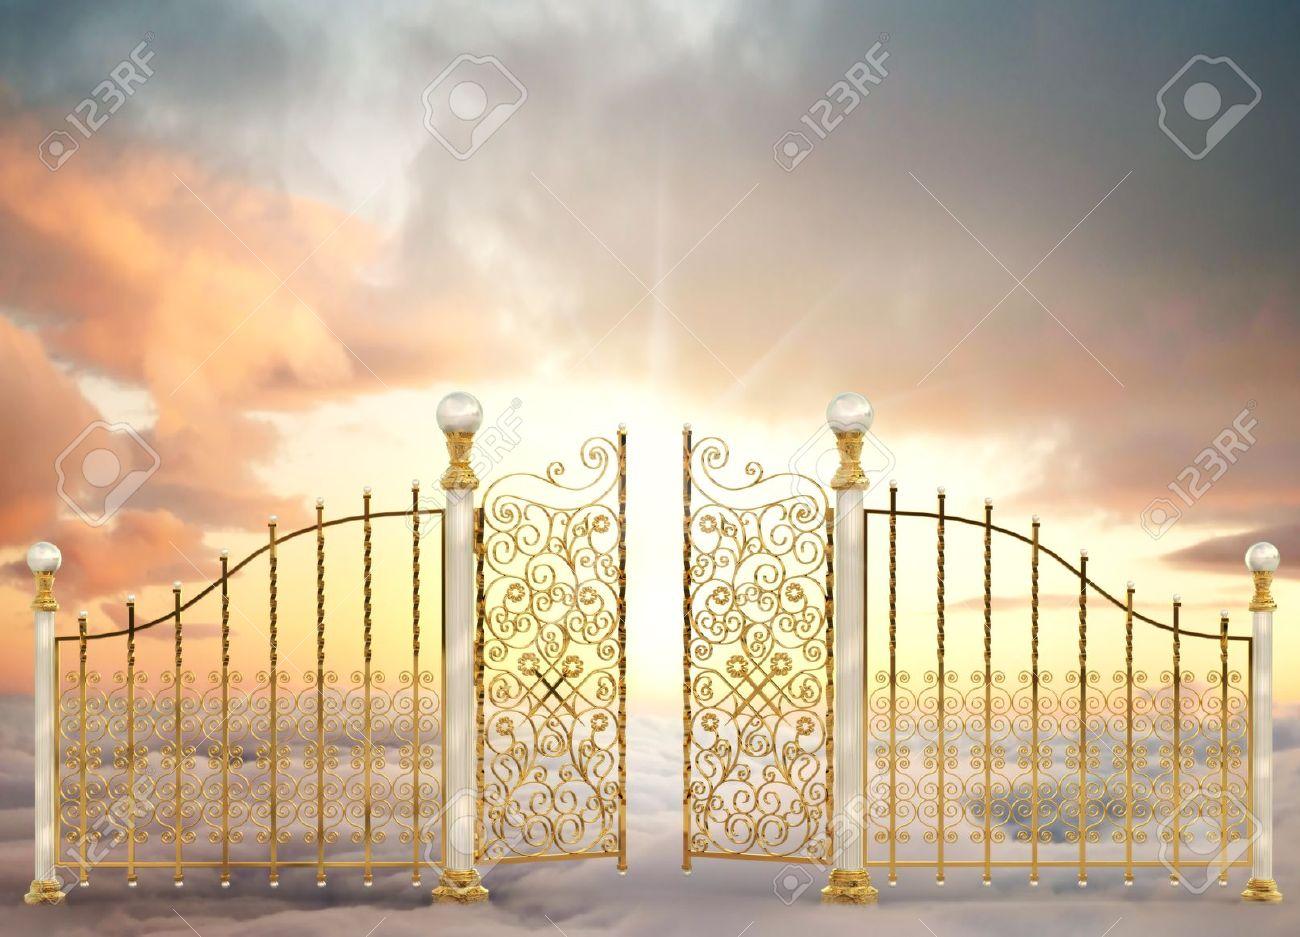 Pearly Gates of Heaven Pearly Gates of Heaven Opening